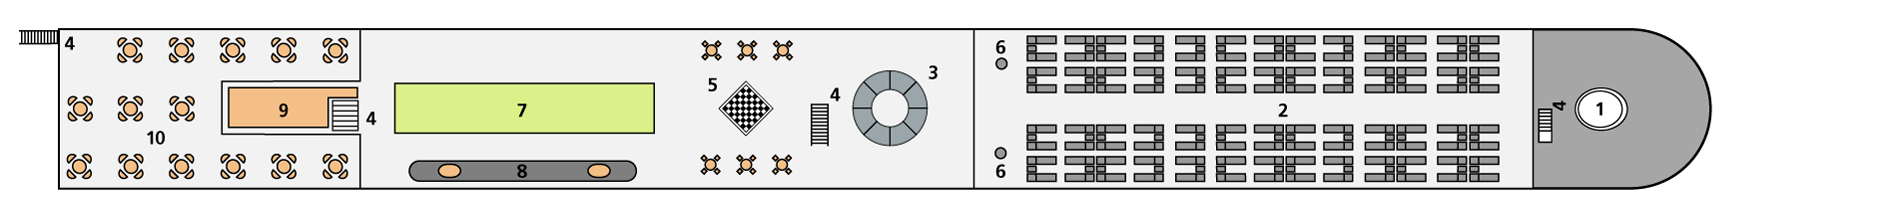 A-ROSA BRAVA Deck 4